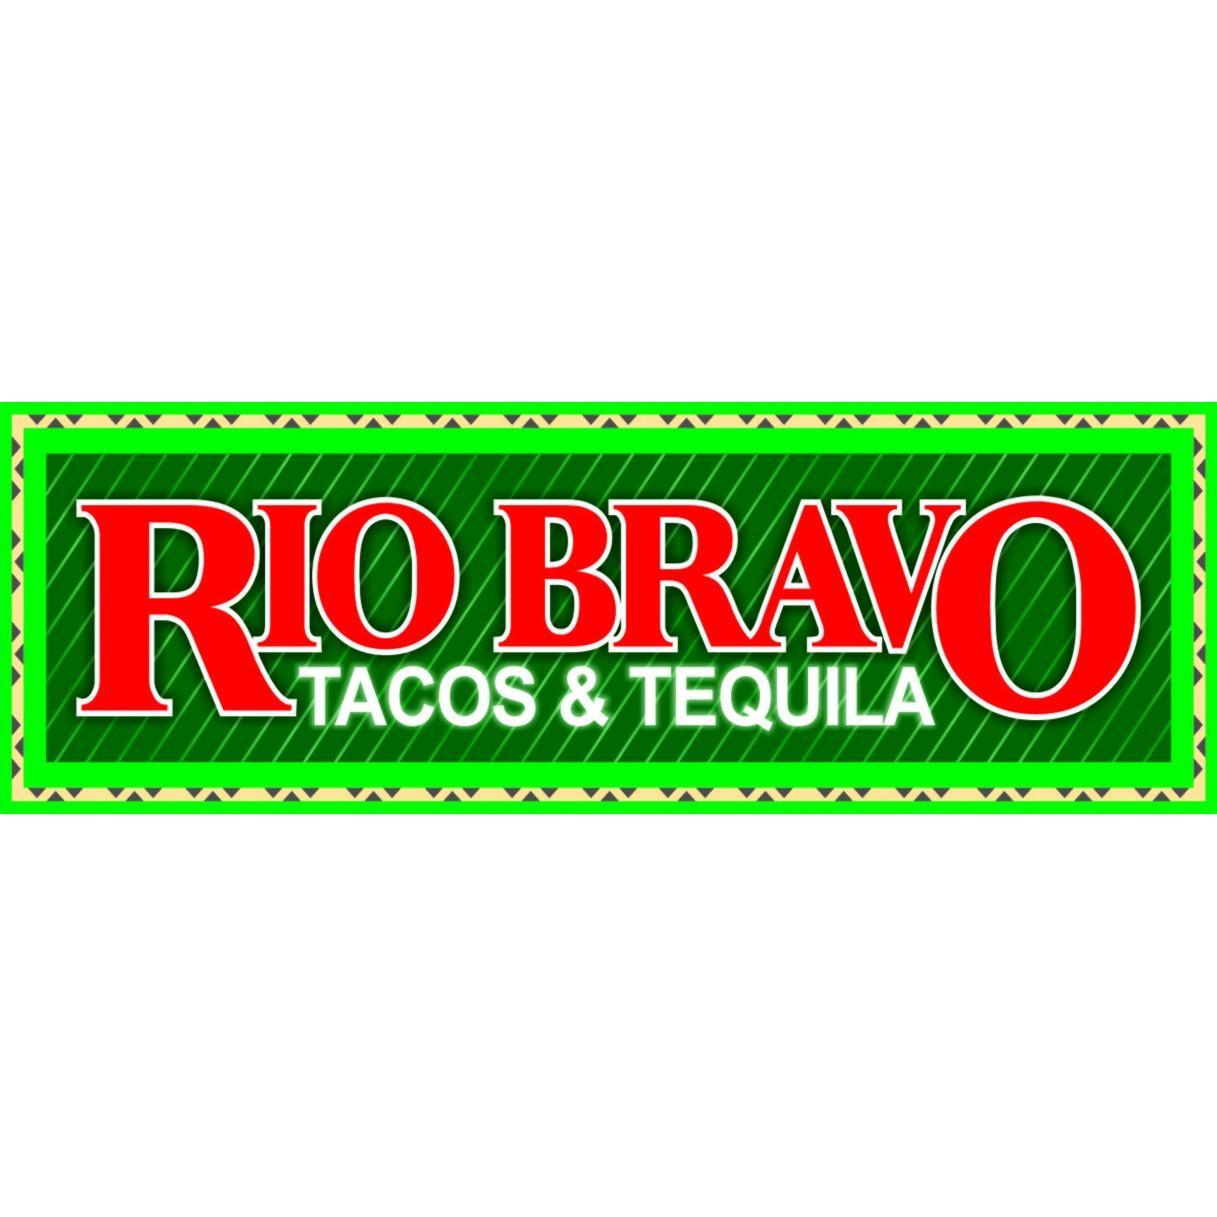 Rio Bravo Tacos & Tequila